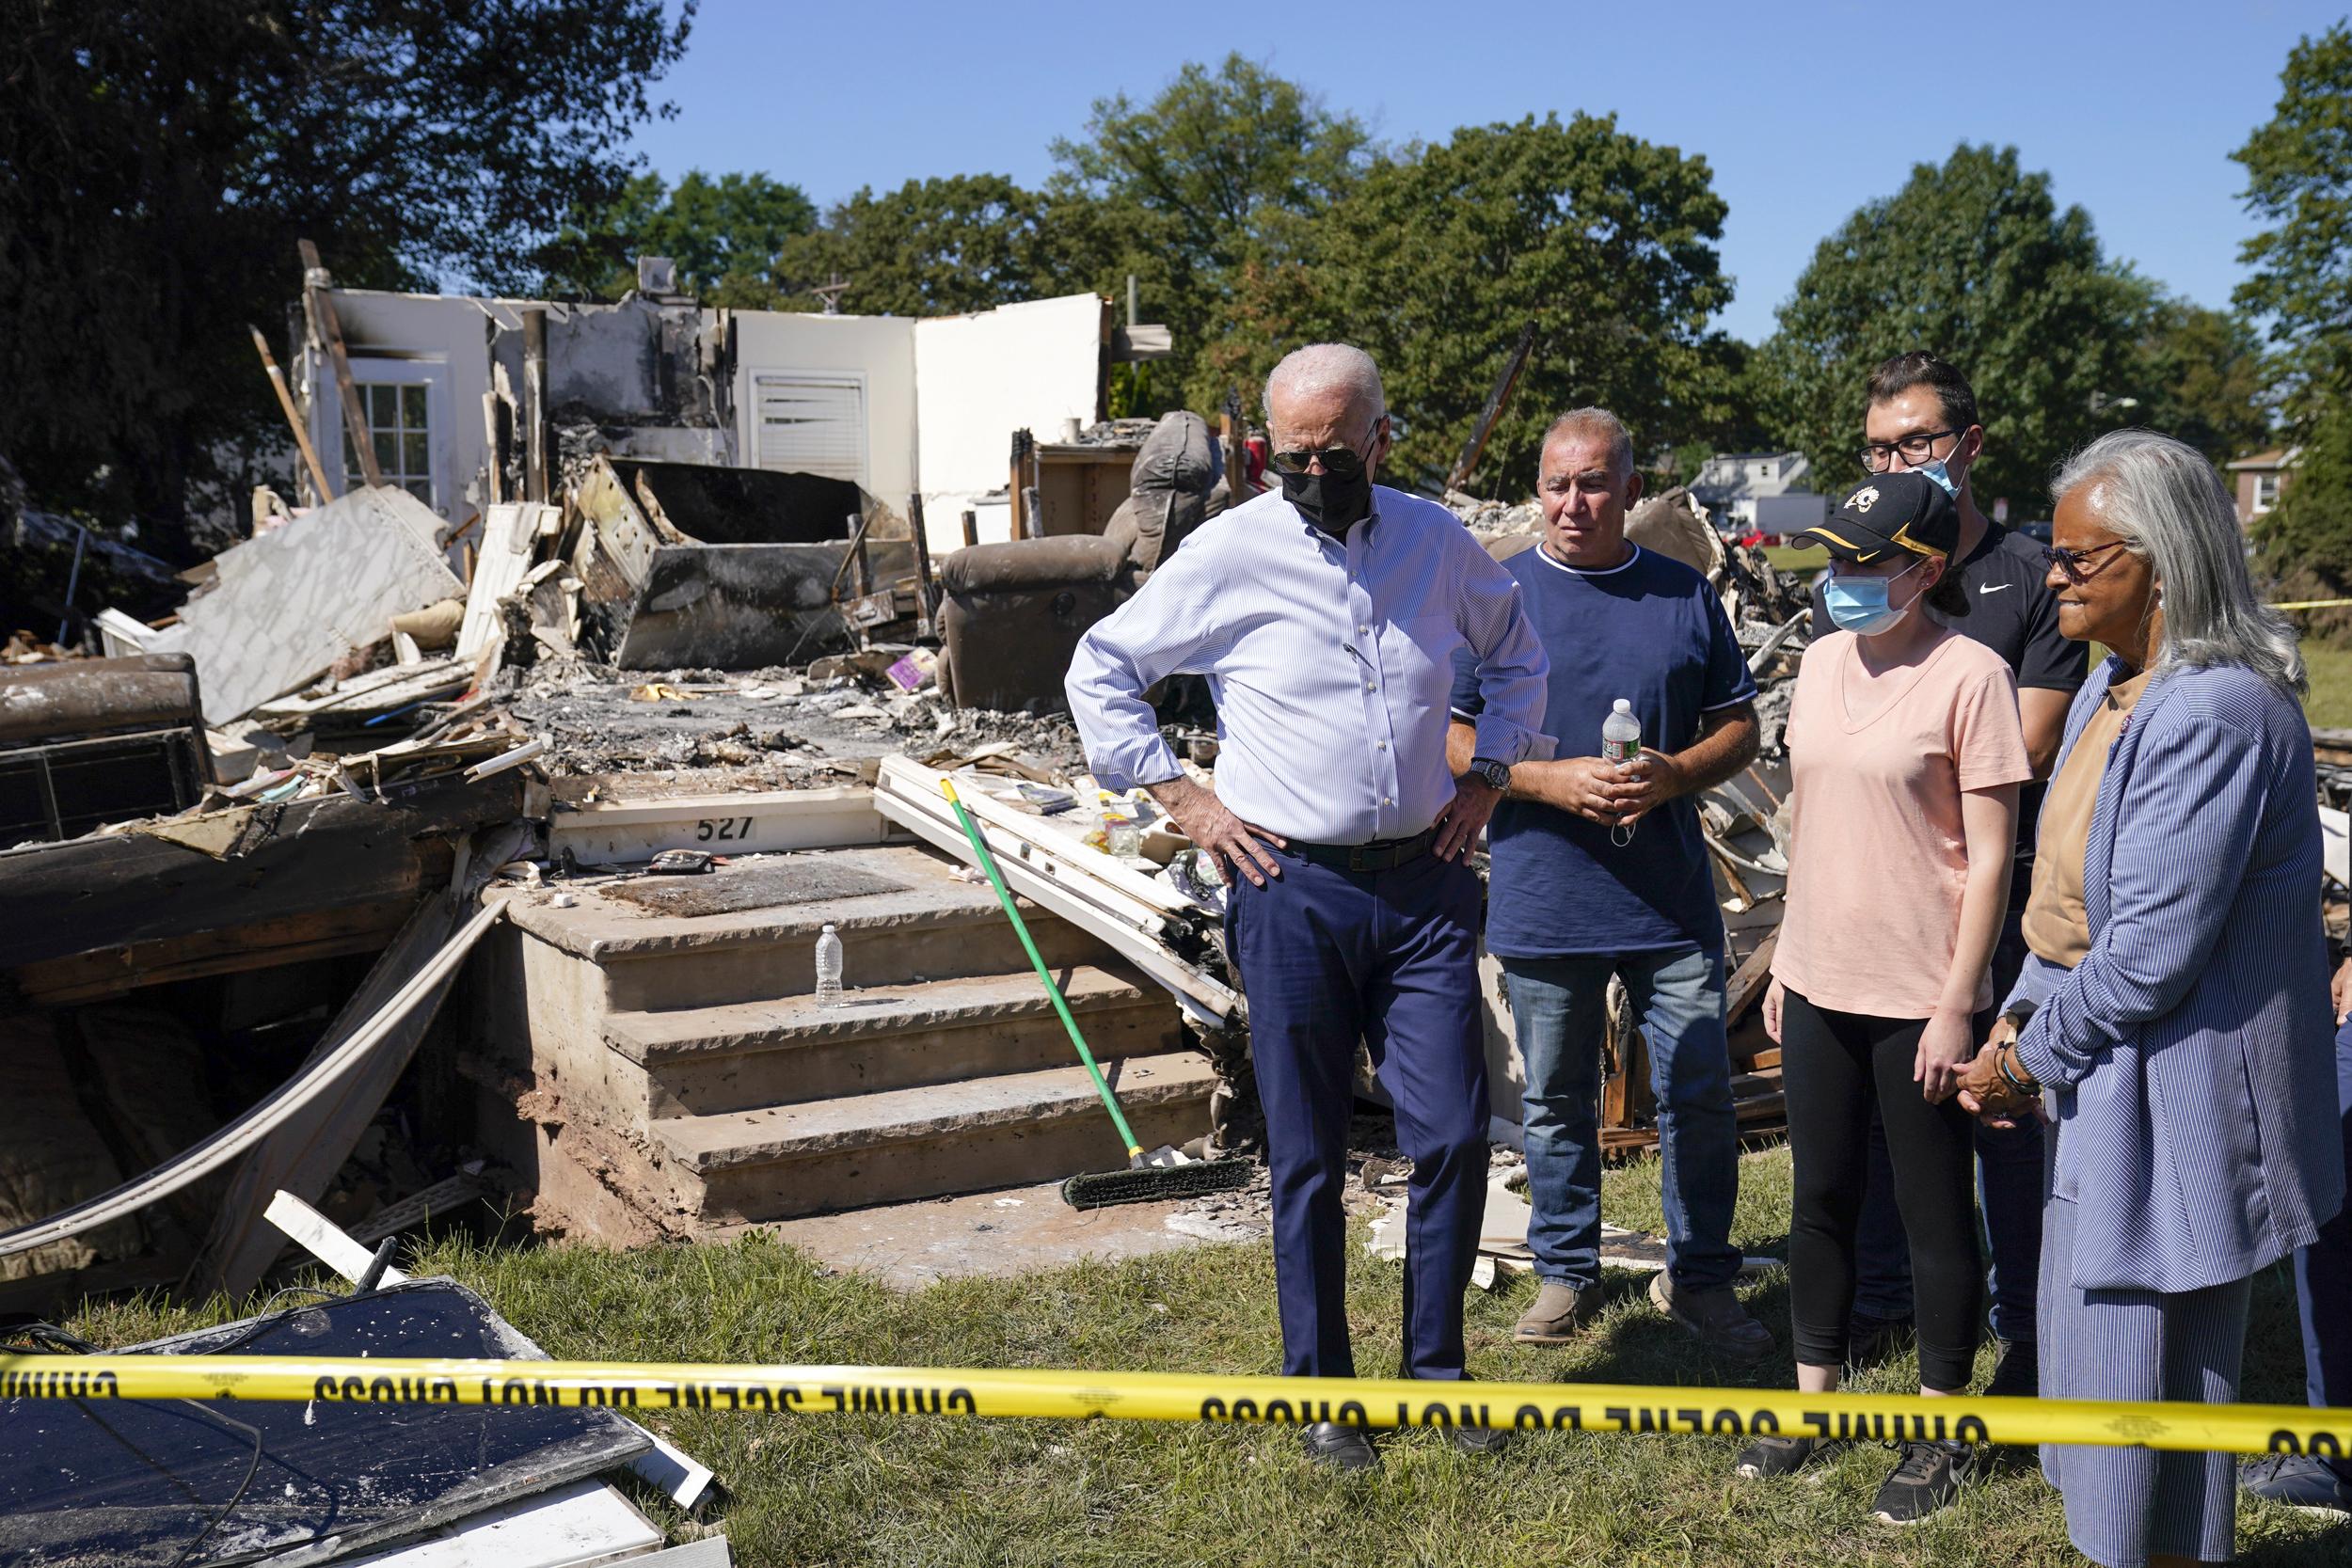 Biden tours Hurricane Ida damage in New York and New Jersey